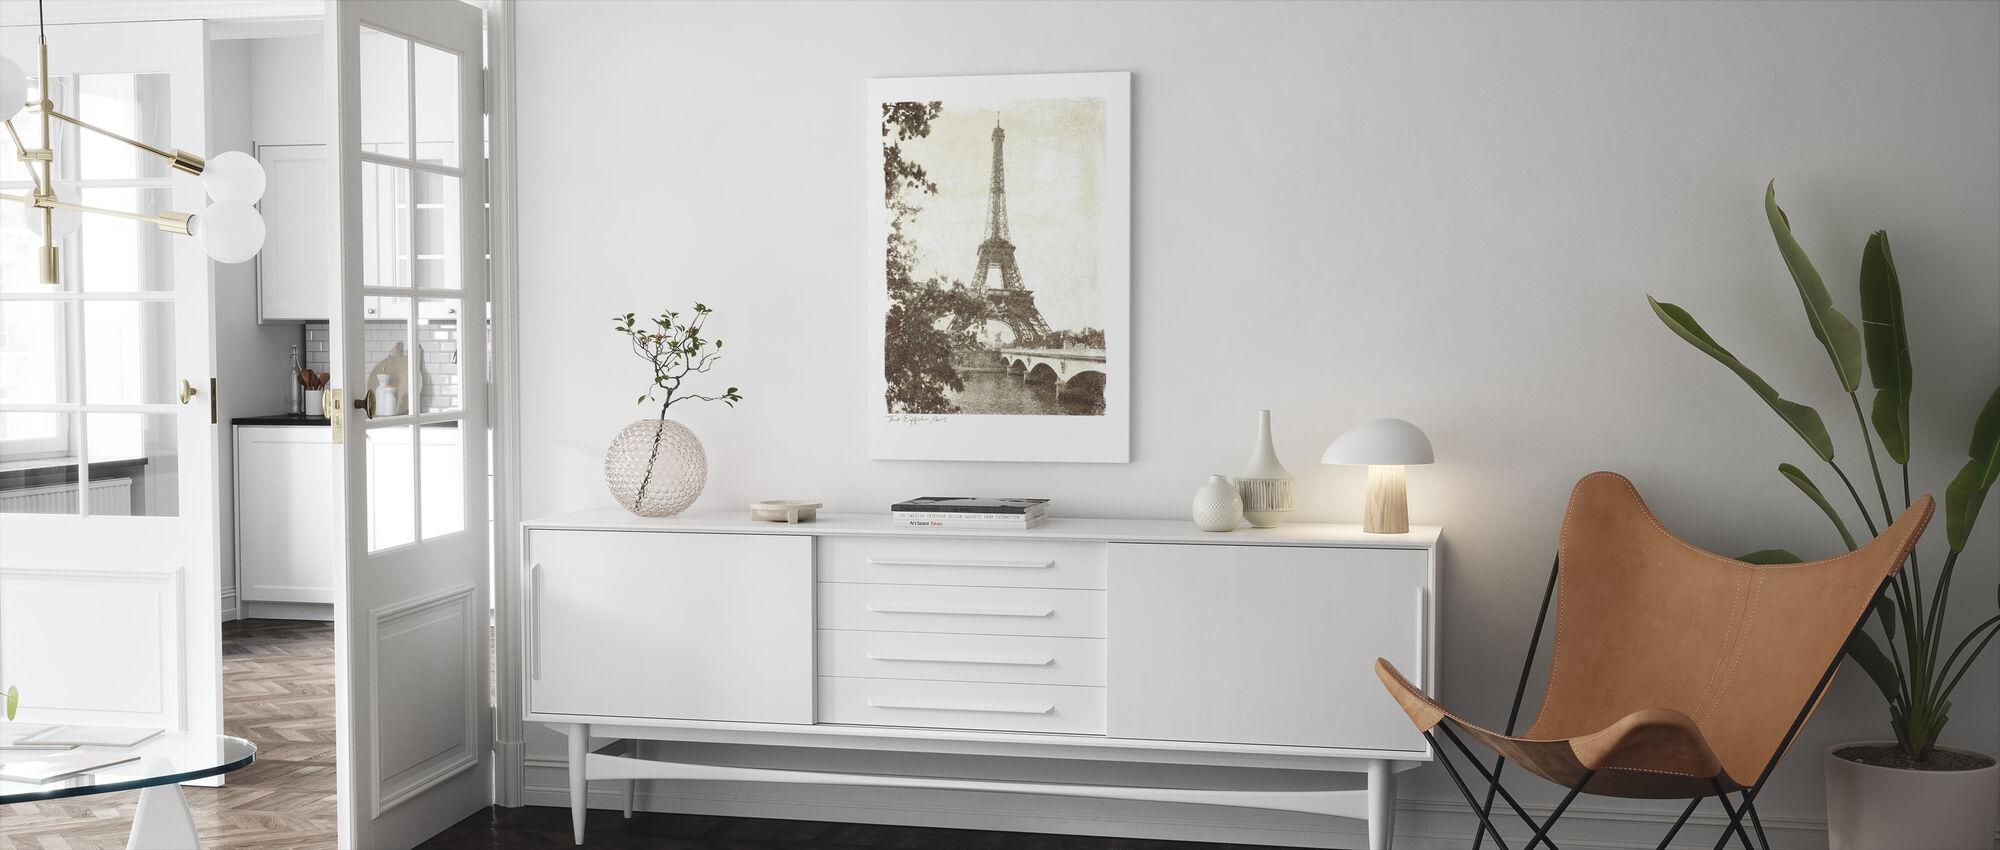 Vintage Eiffeltårnet - Lerretsbilde - Stue